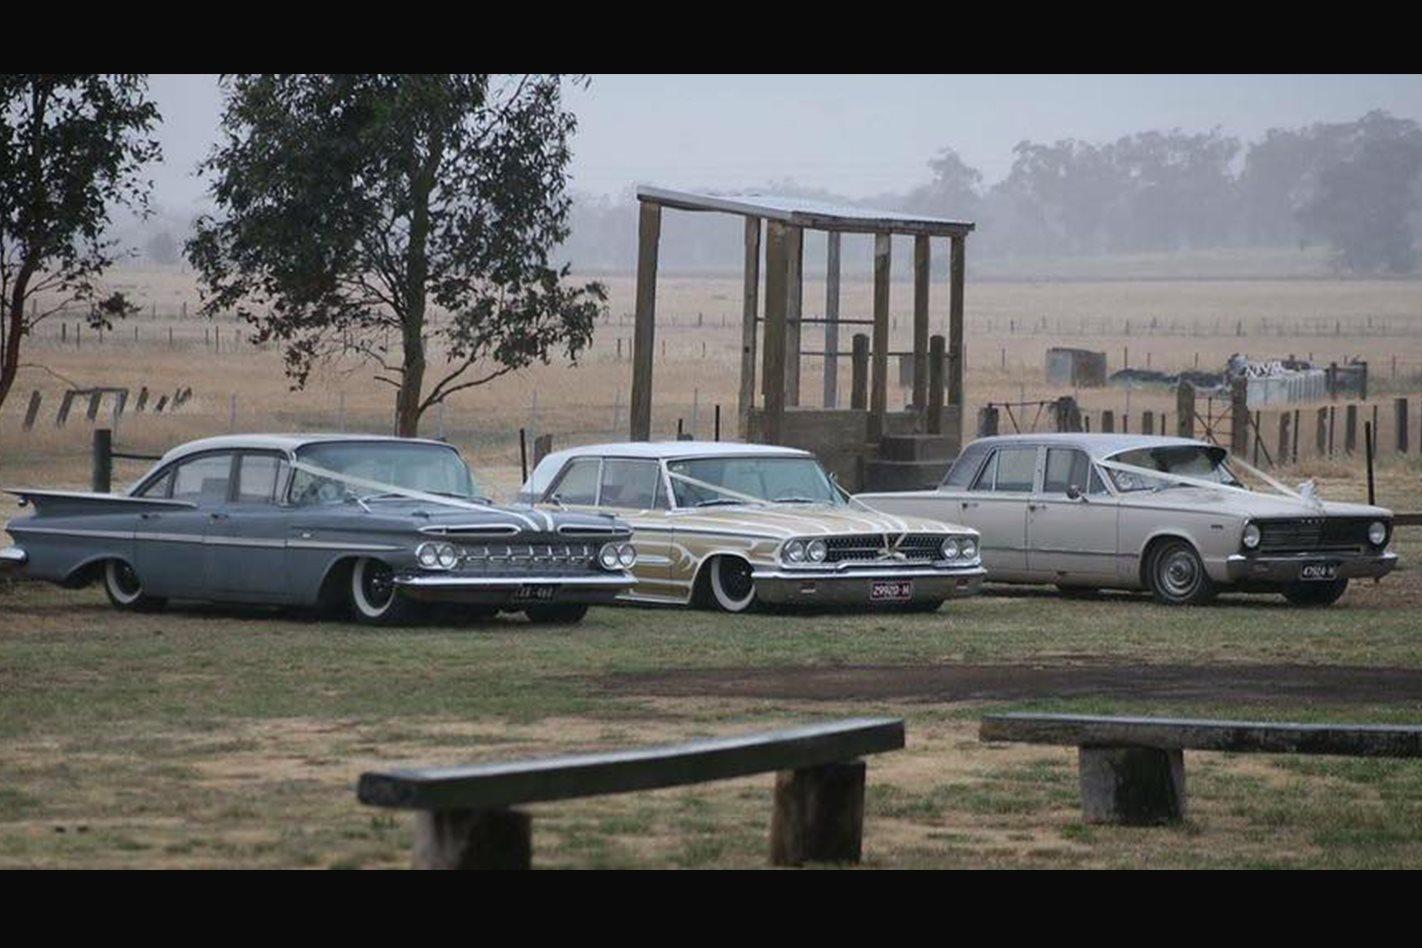 Christopher O'Sullivan's wedding cars